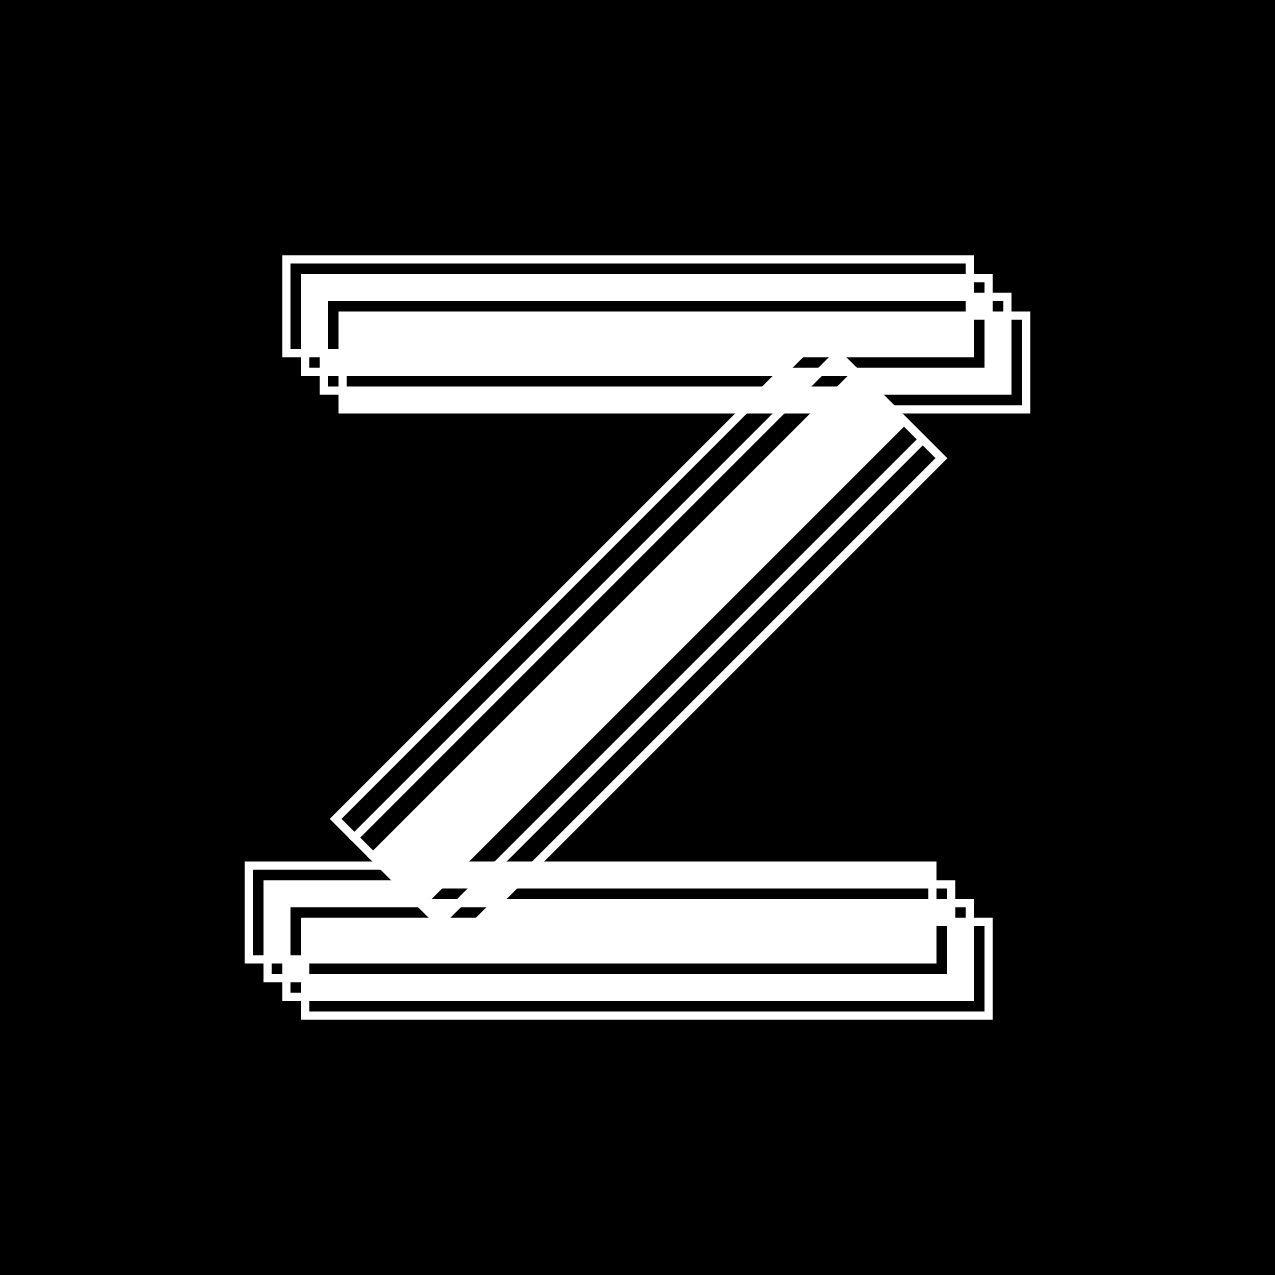 Letter Z5 Design by Furia